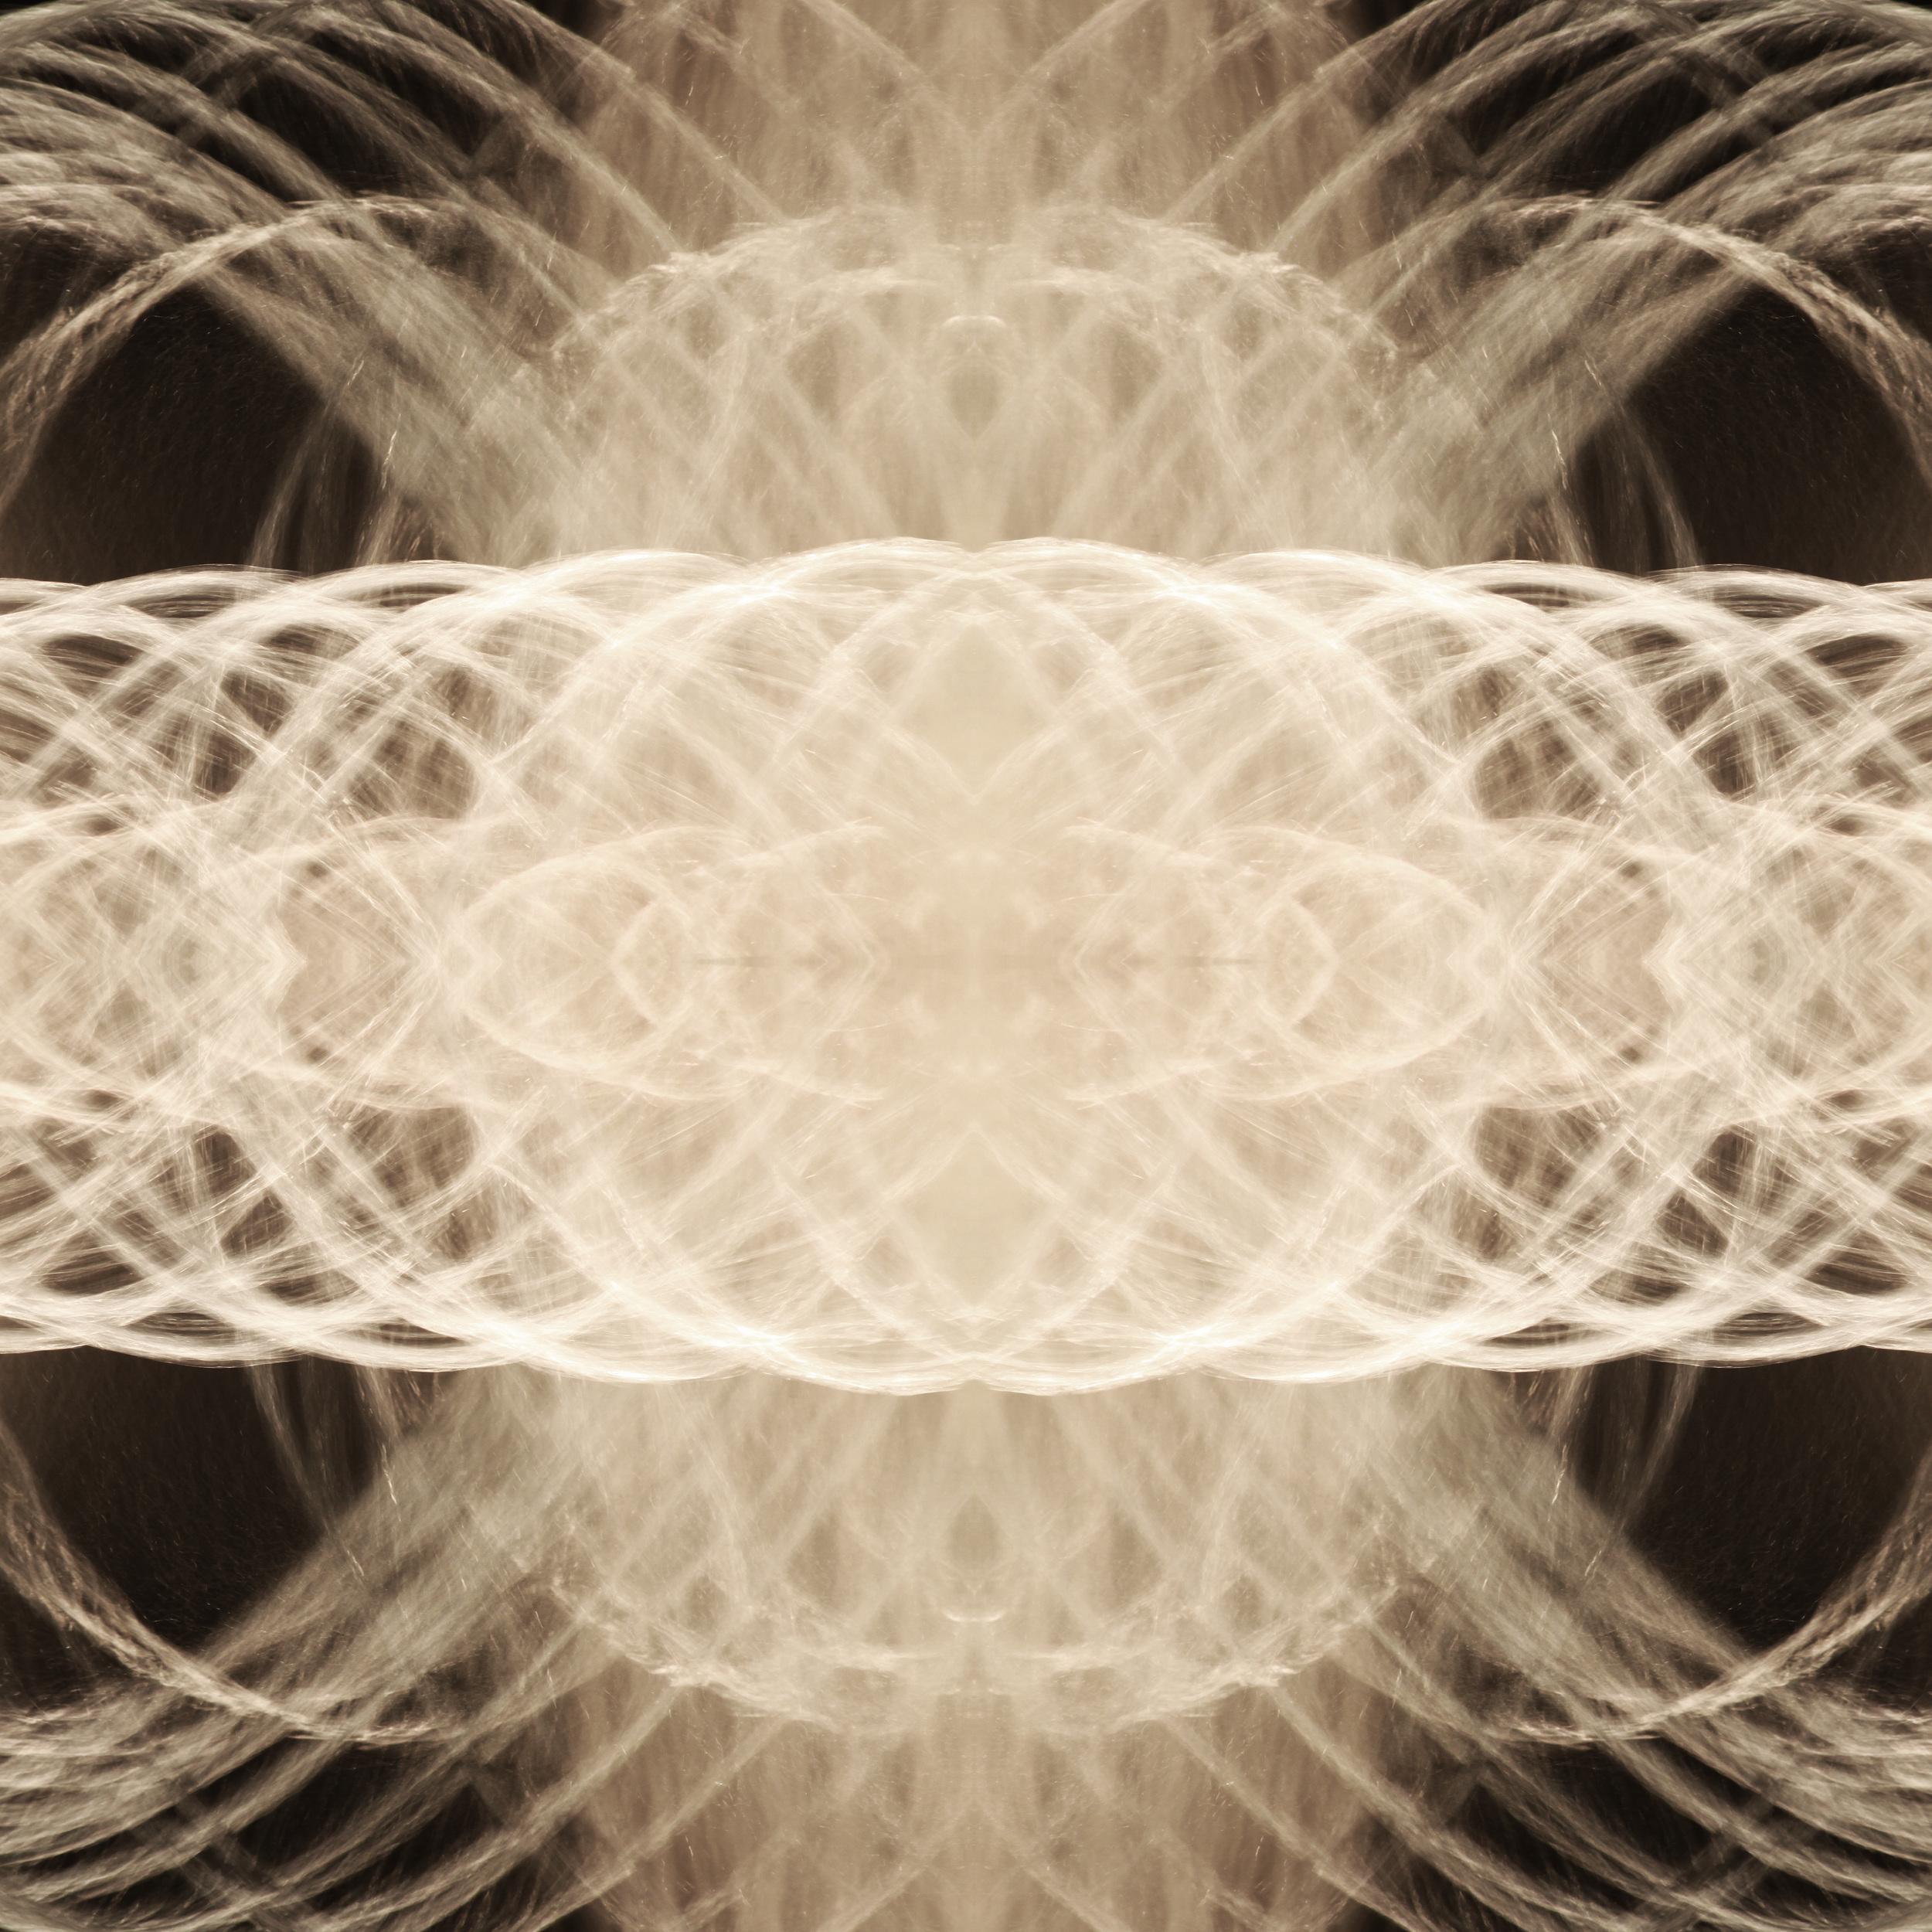 Gyroscope1.jpg